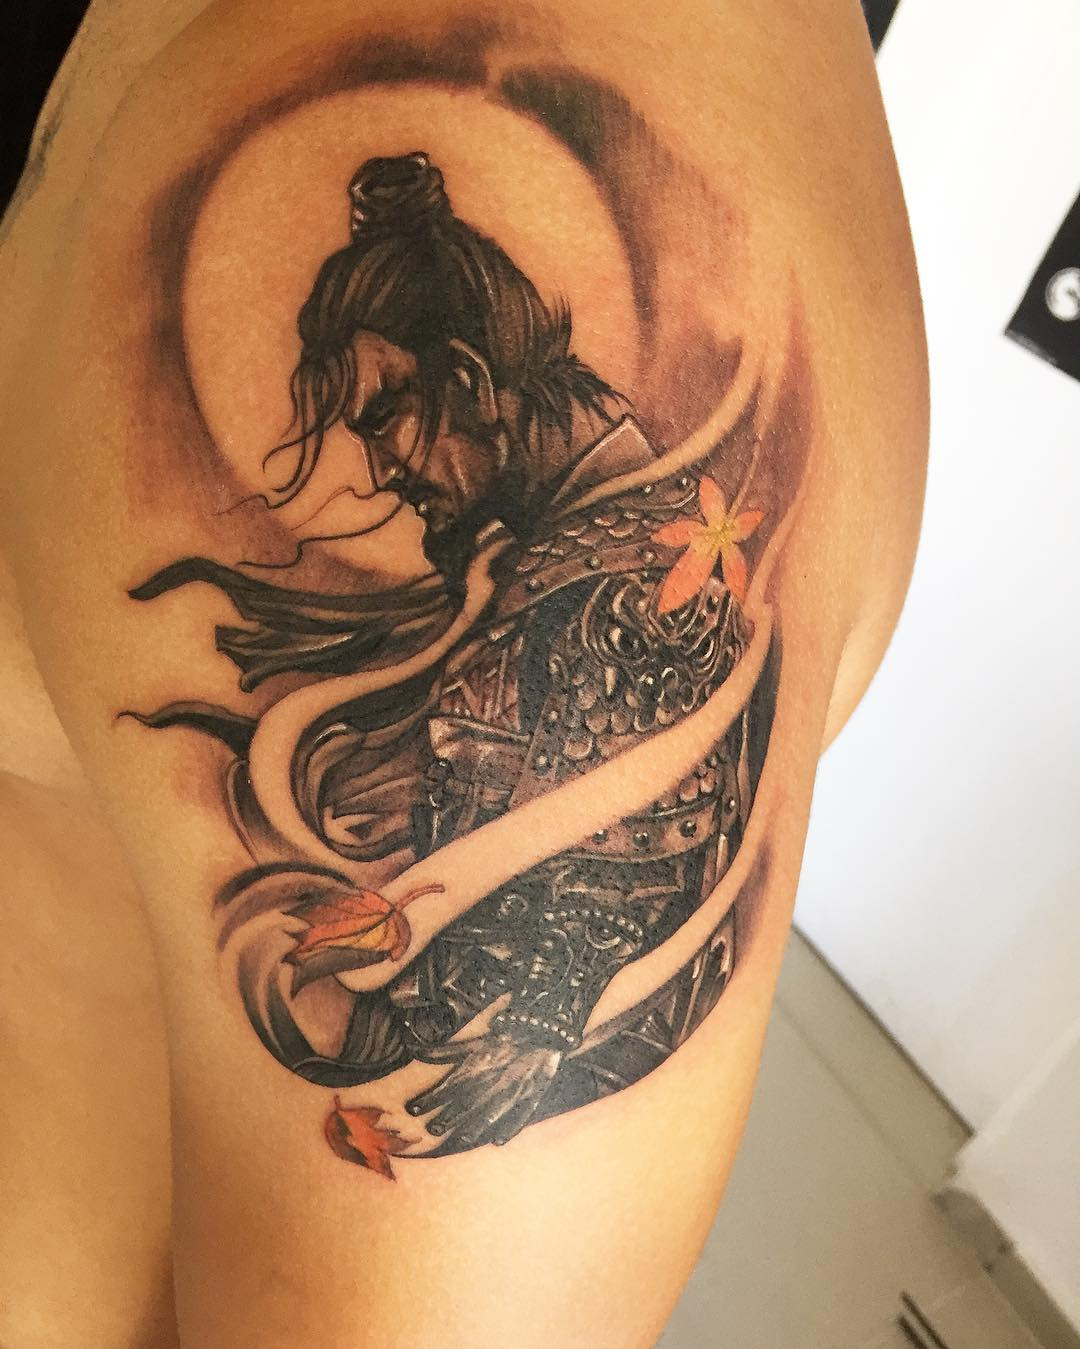 Designs Meanings 2019: 75+ Best Japanese Samurai Tattoo